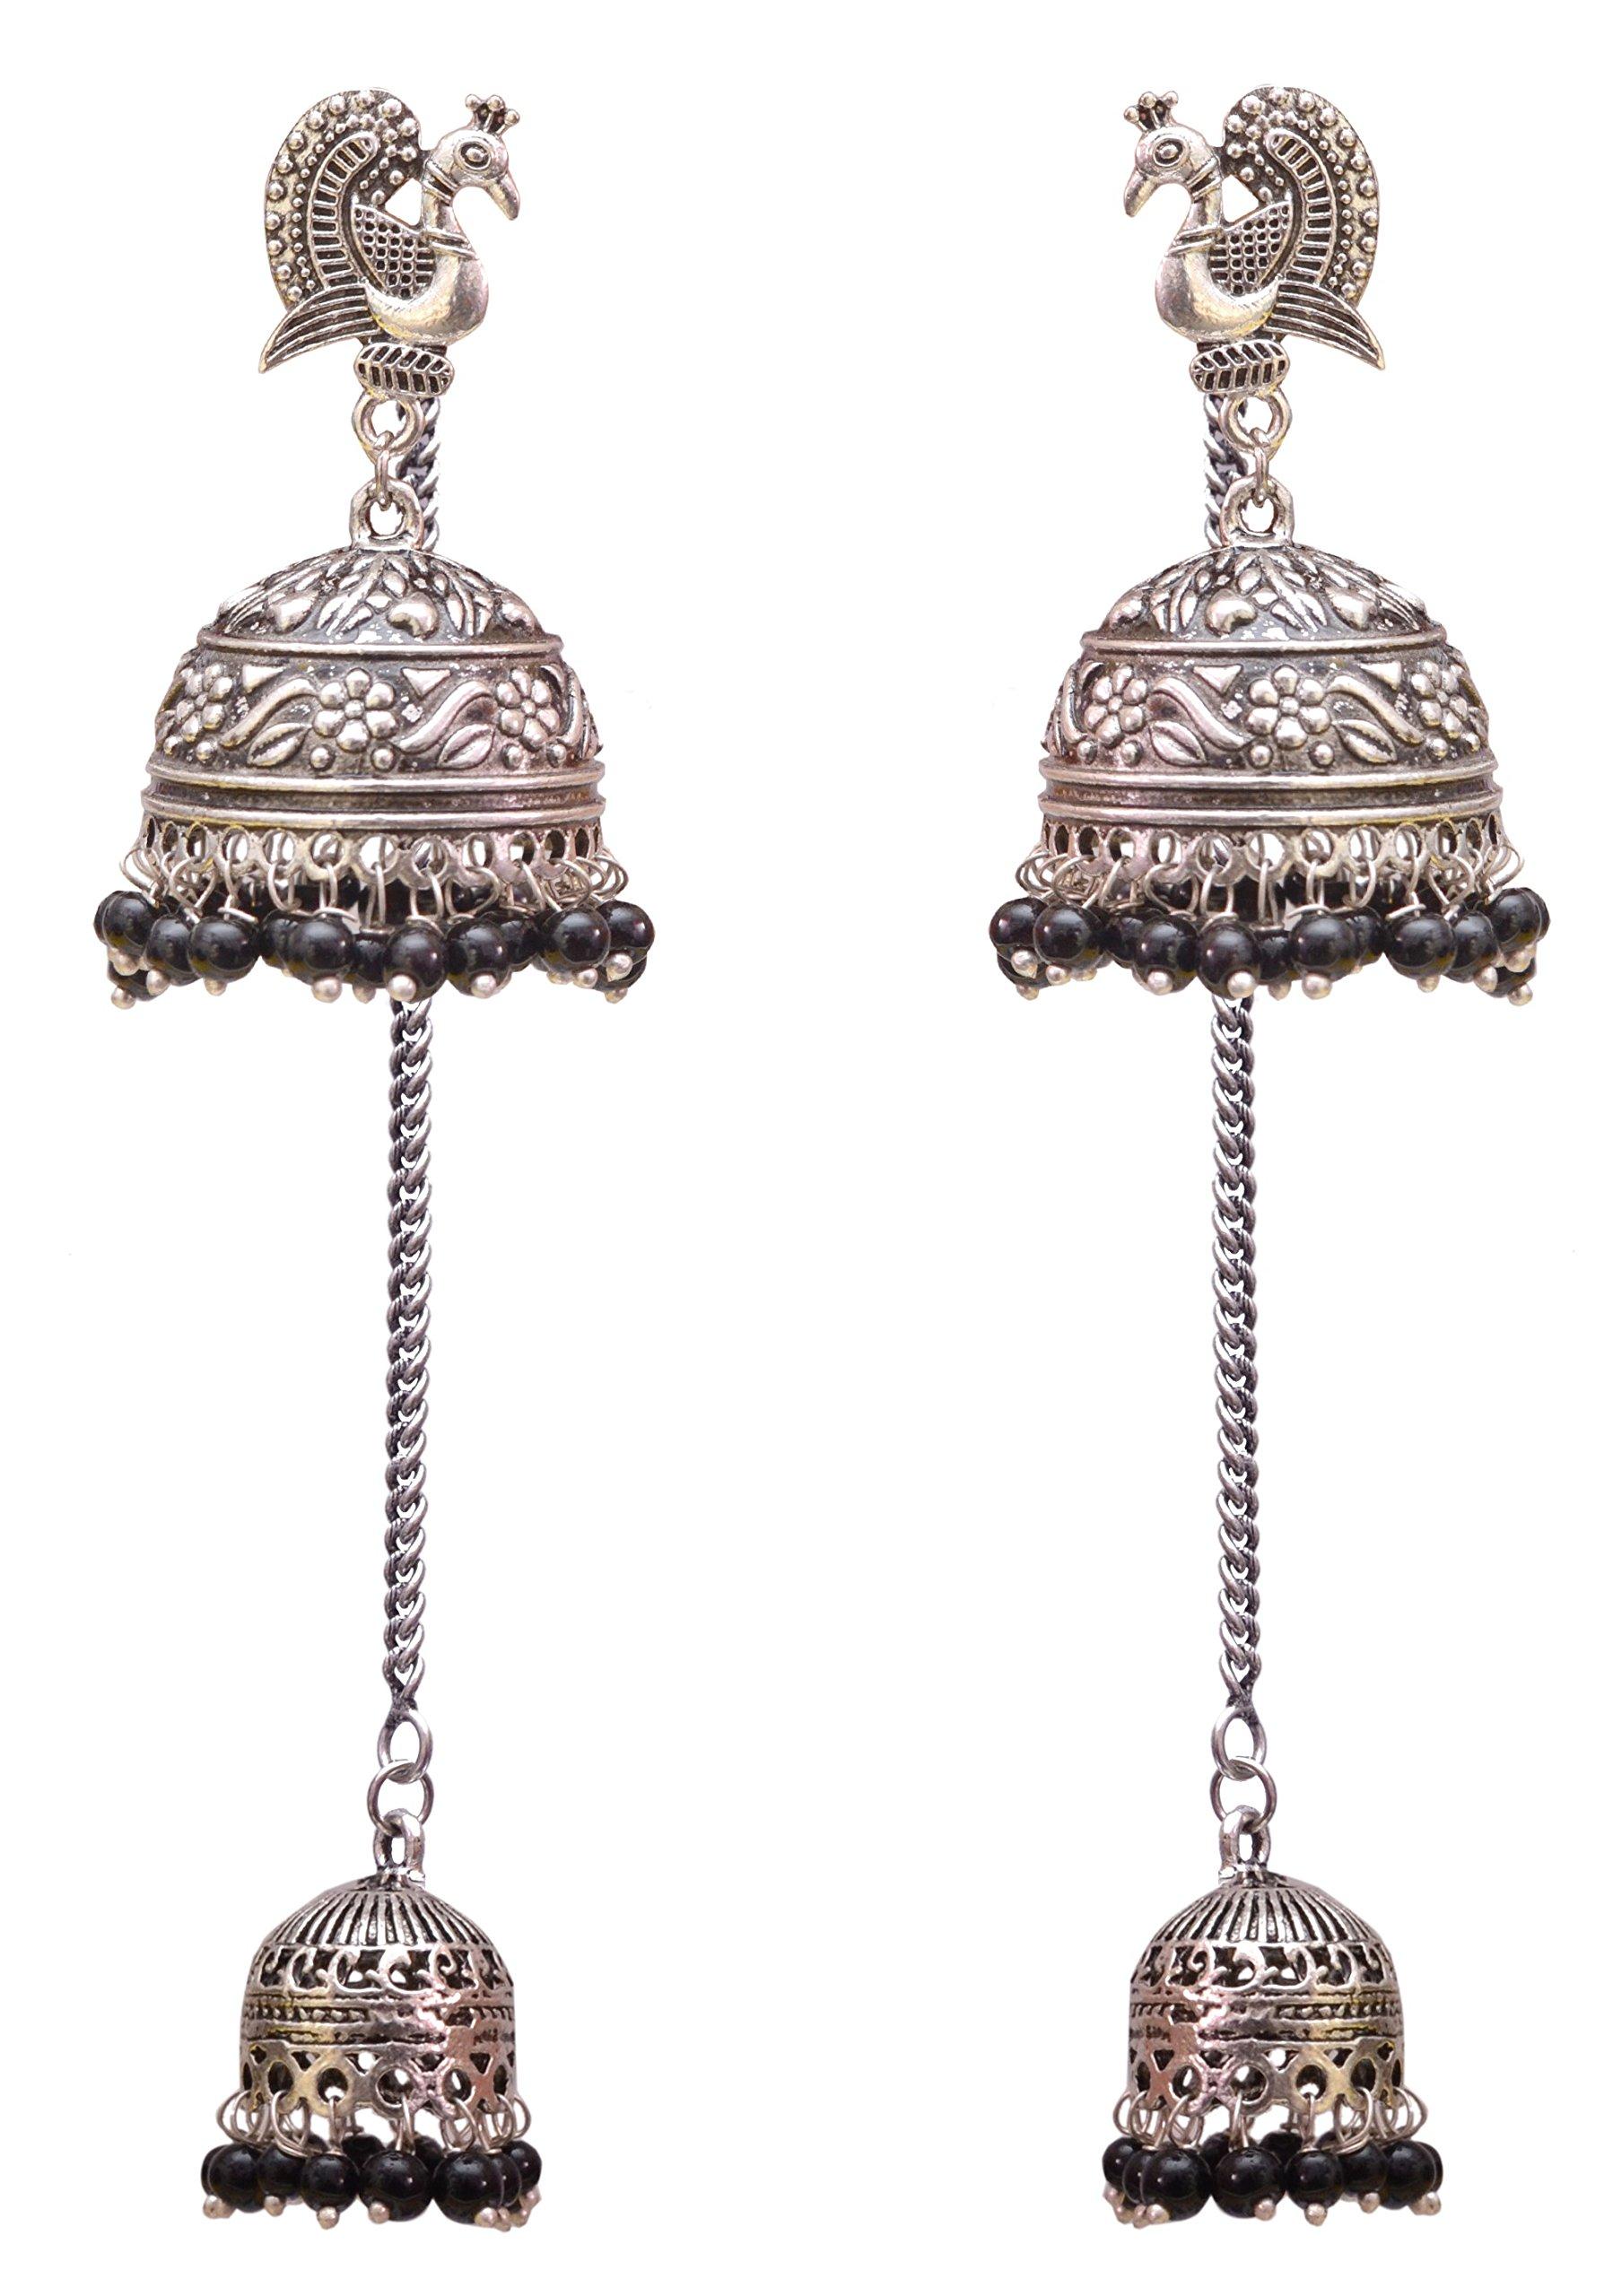 Sansar India Oxidized Kashmiri Jhumka Jhumki Indian Earrings Jewelry for Girls and Women